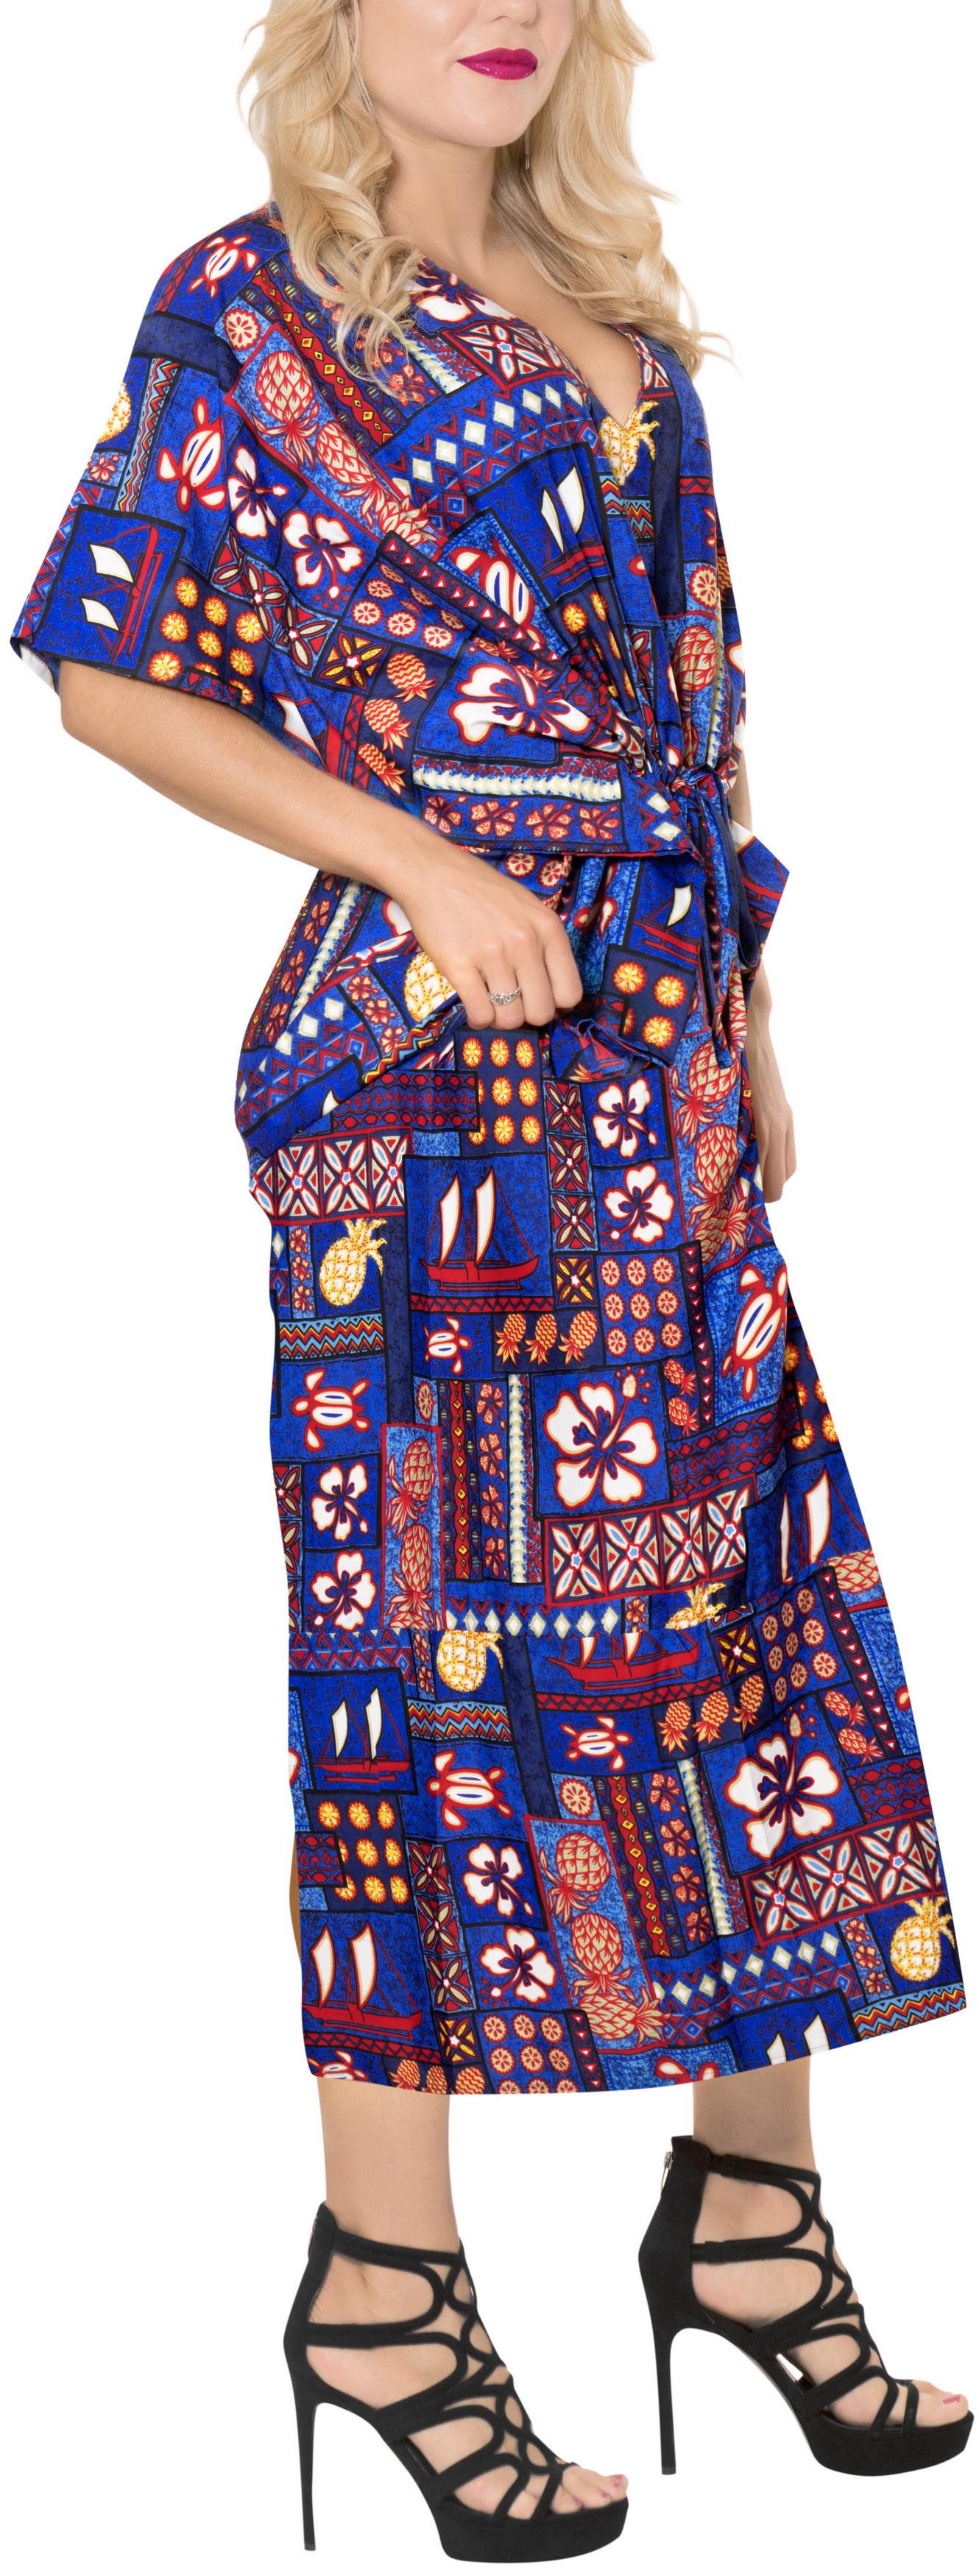 832622b212df HAPPY BAY - Ladies Hawaiian Plus Size Dress Evening Kaftan For Womens Long  Maternity Maxi Caftan WM_Blue_F244 - Walmart.com